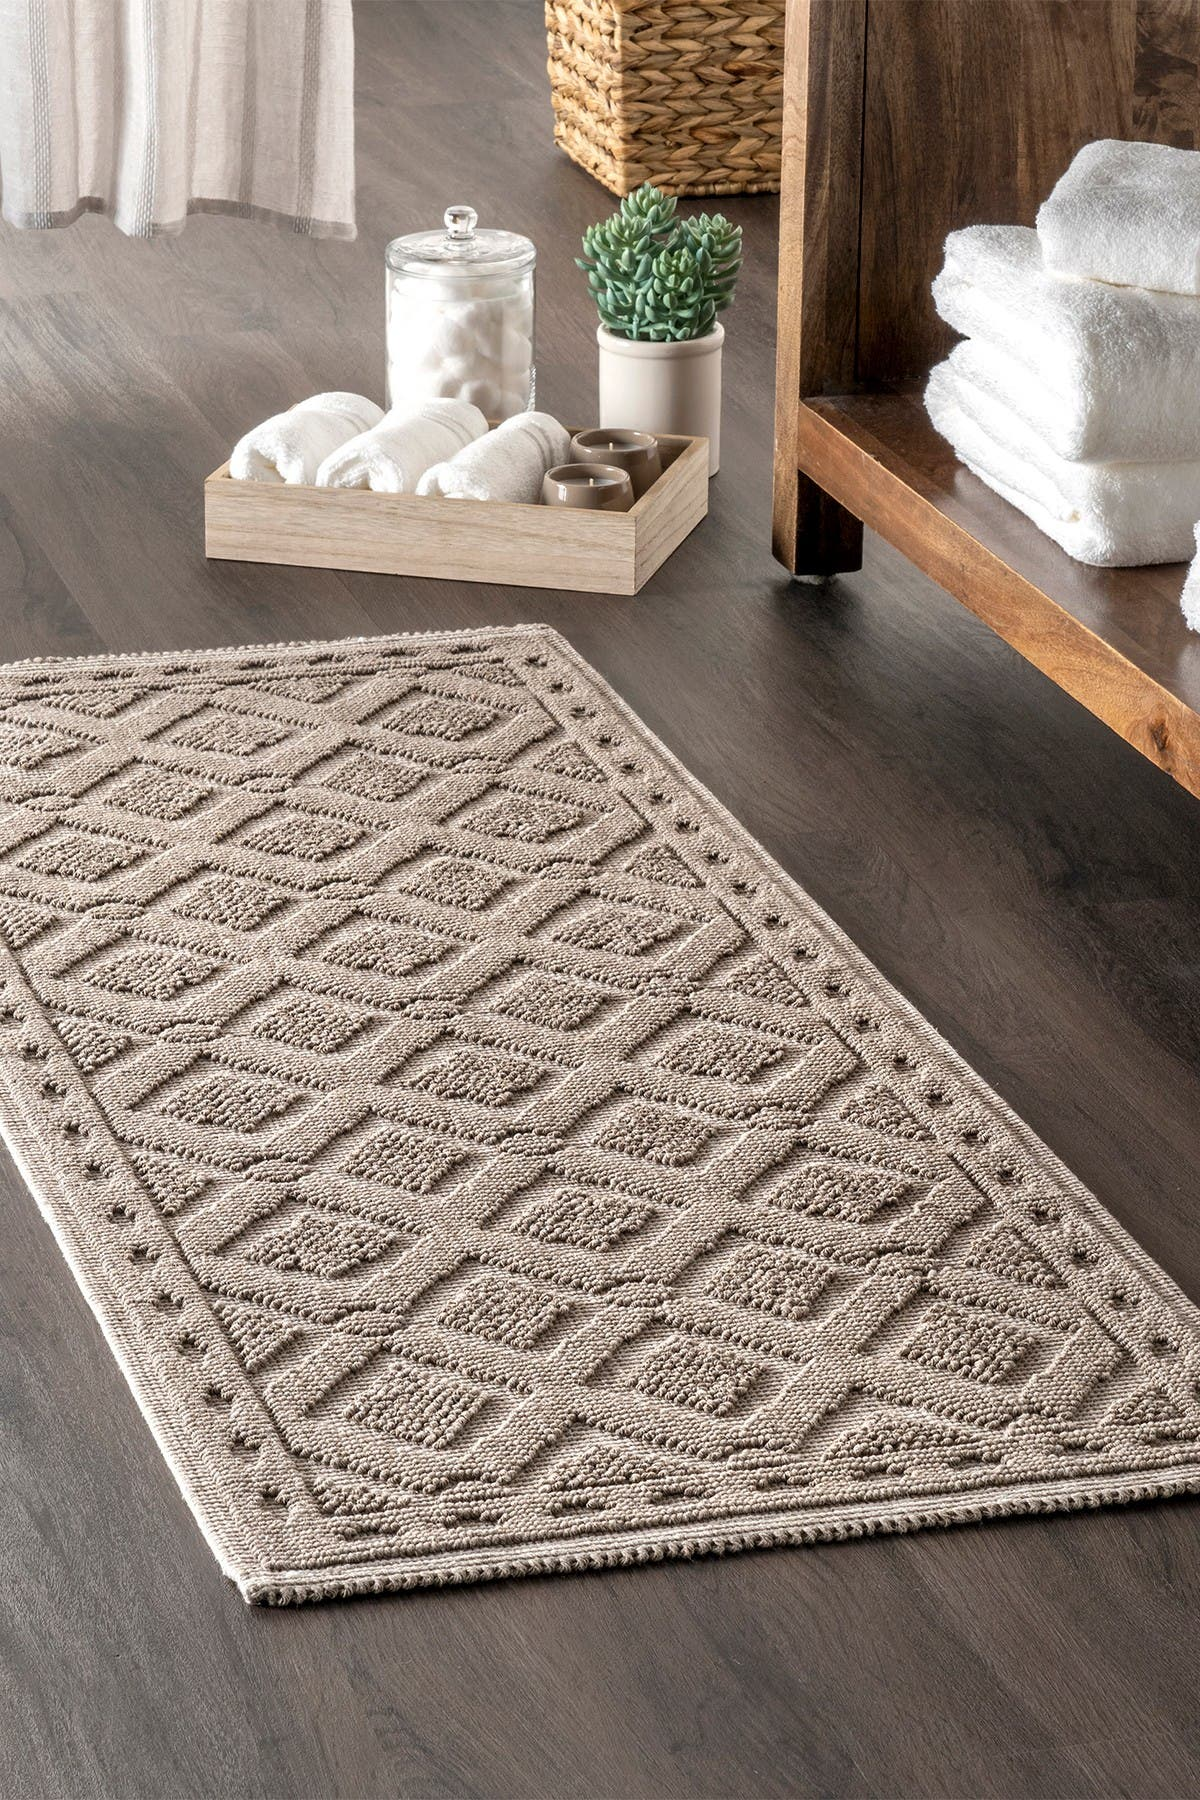 Image of nuLOOM Colton Textured Geometric Trellis Bath Mat